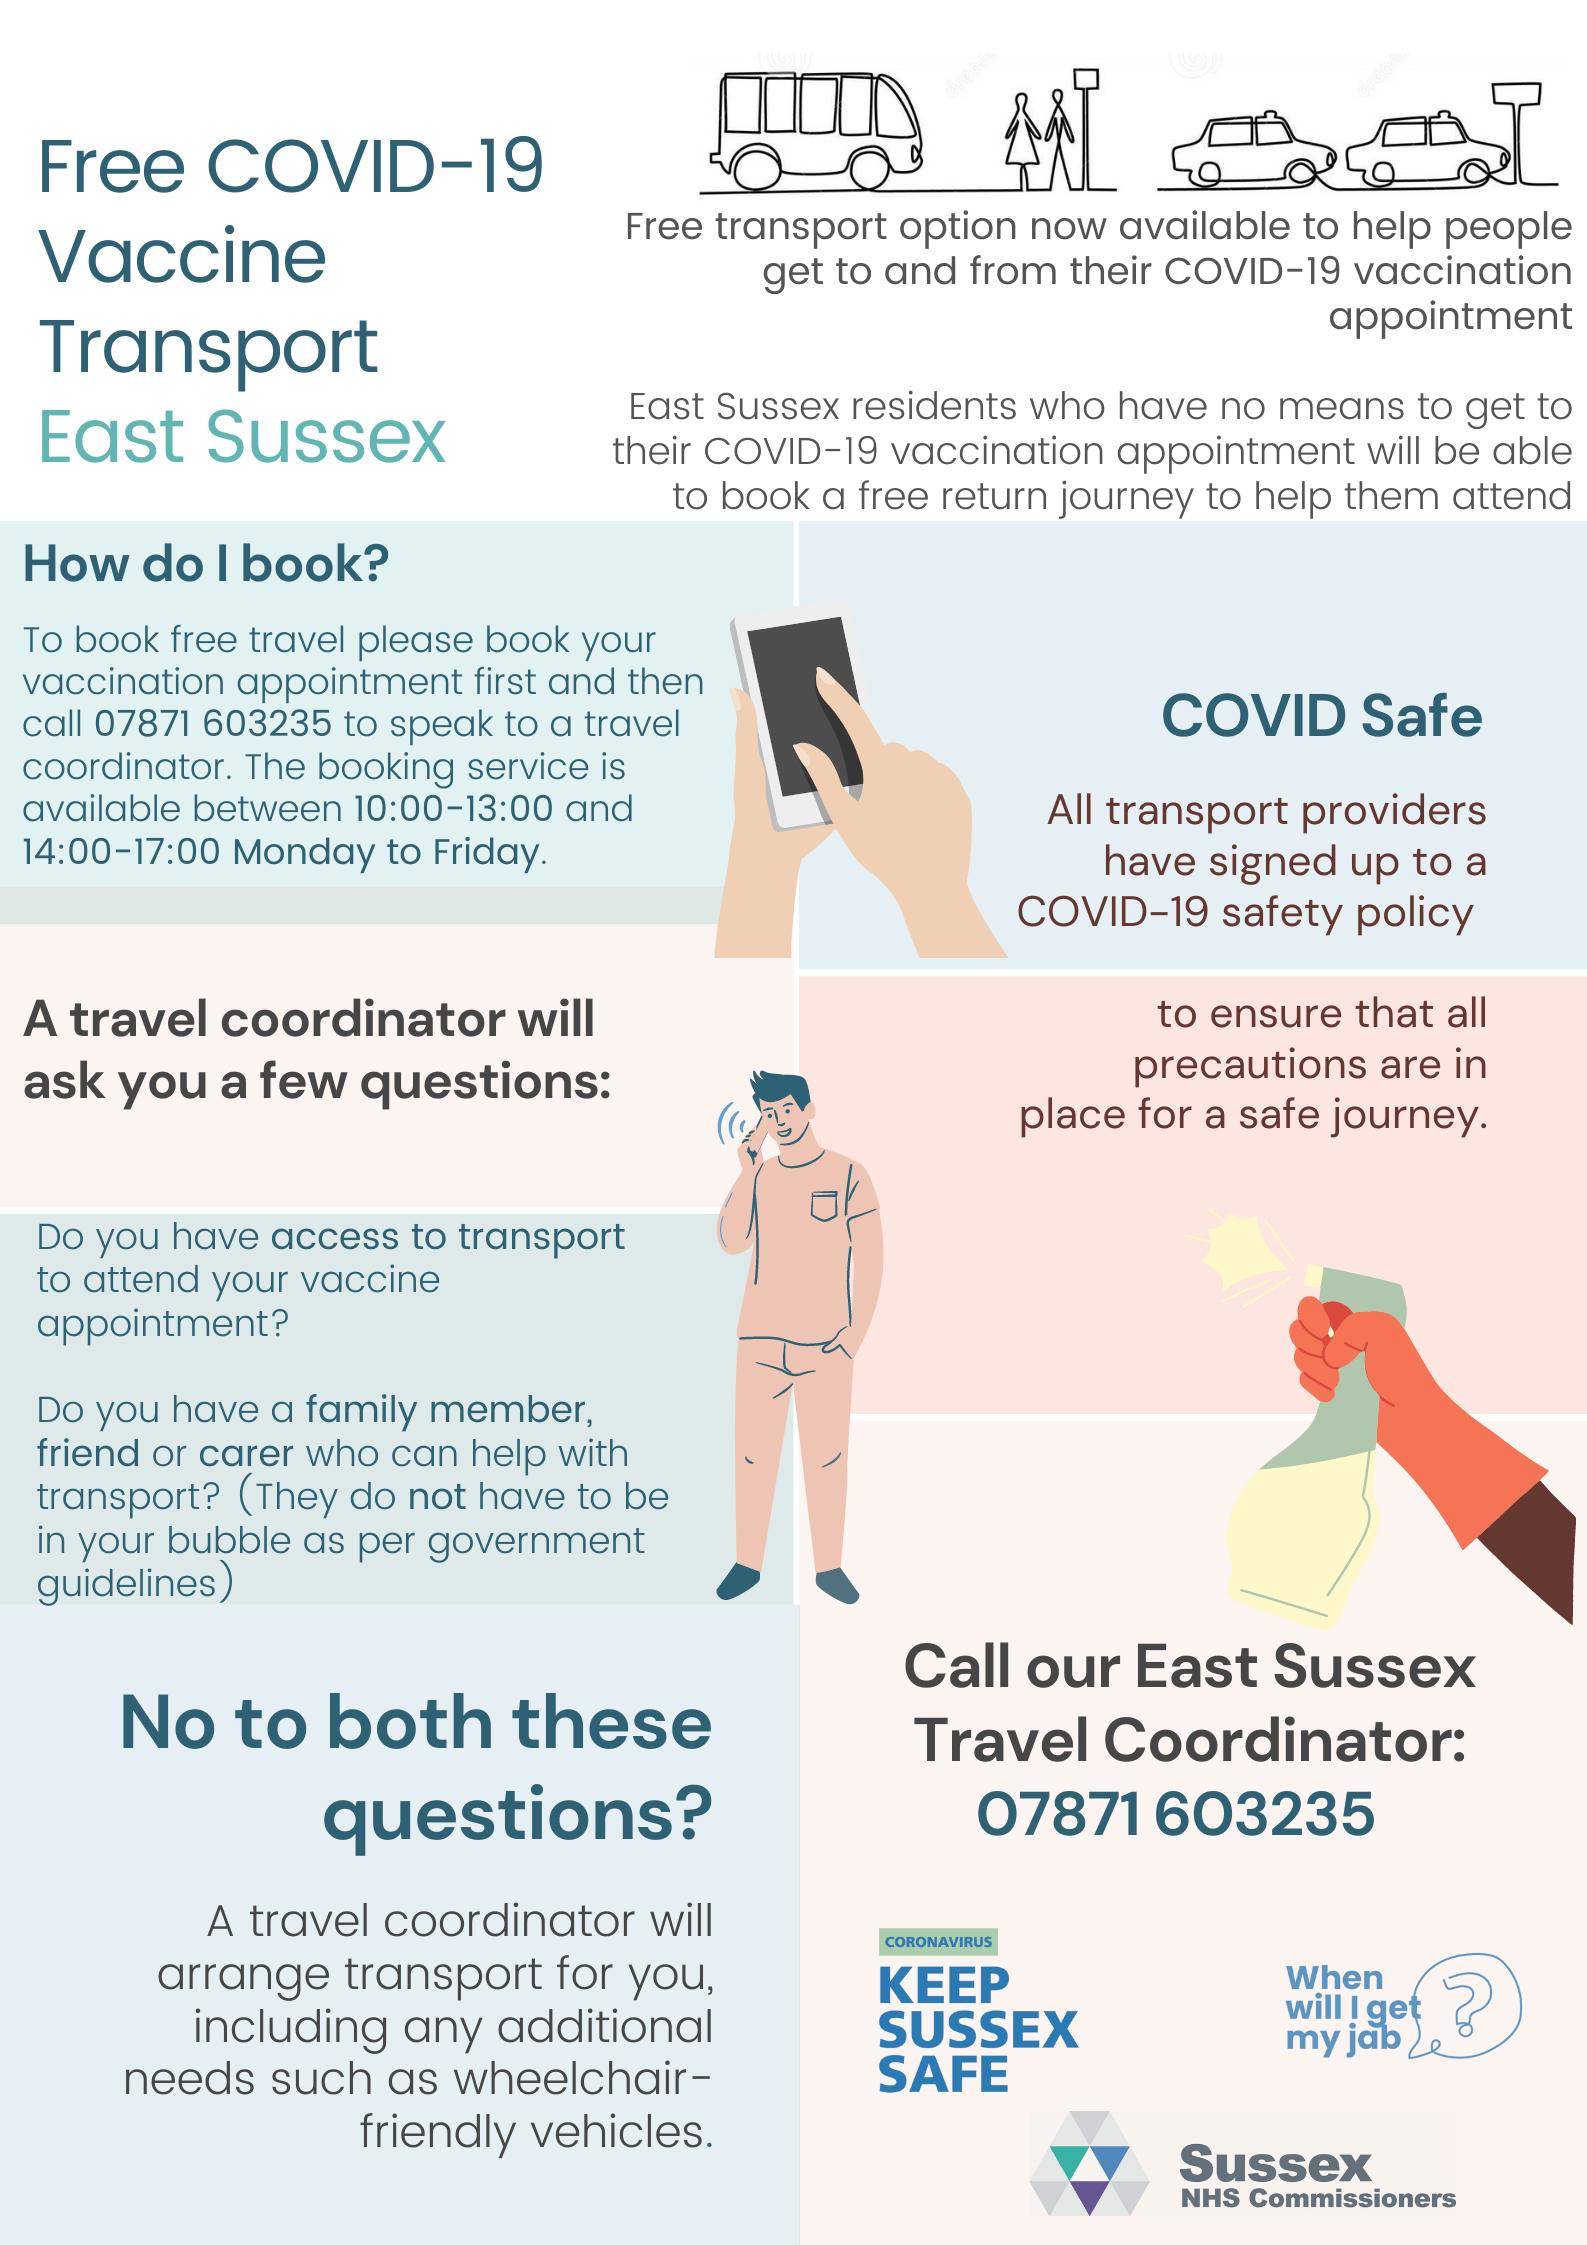 Free COVID-19 Vaccine Transport